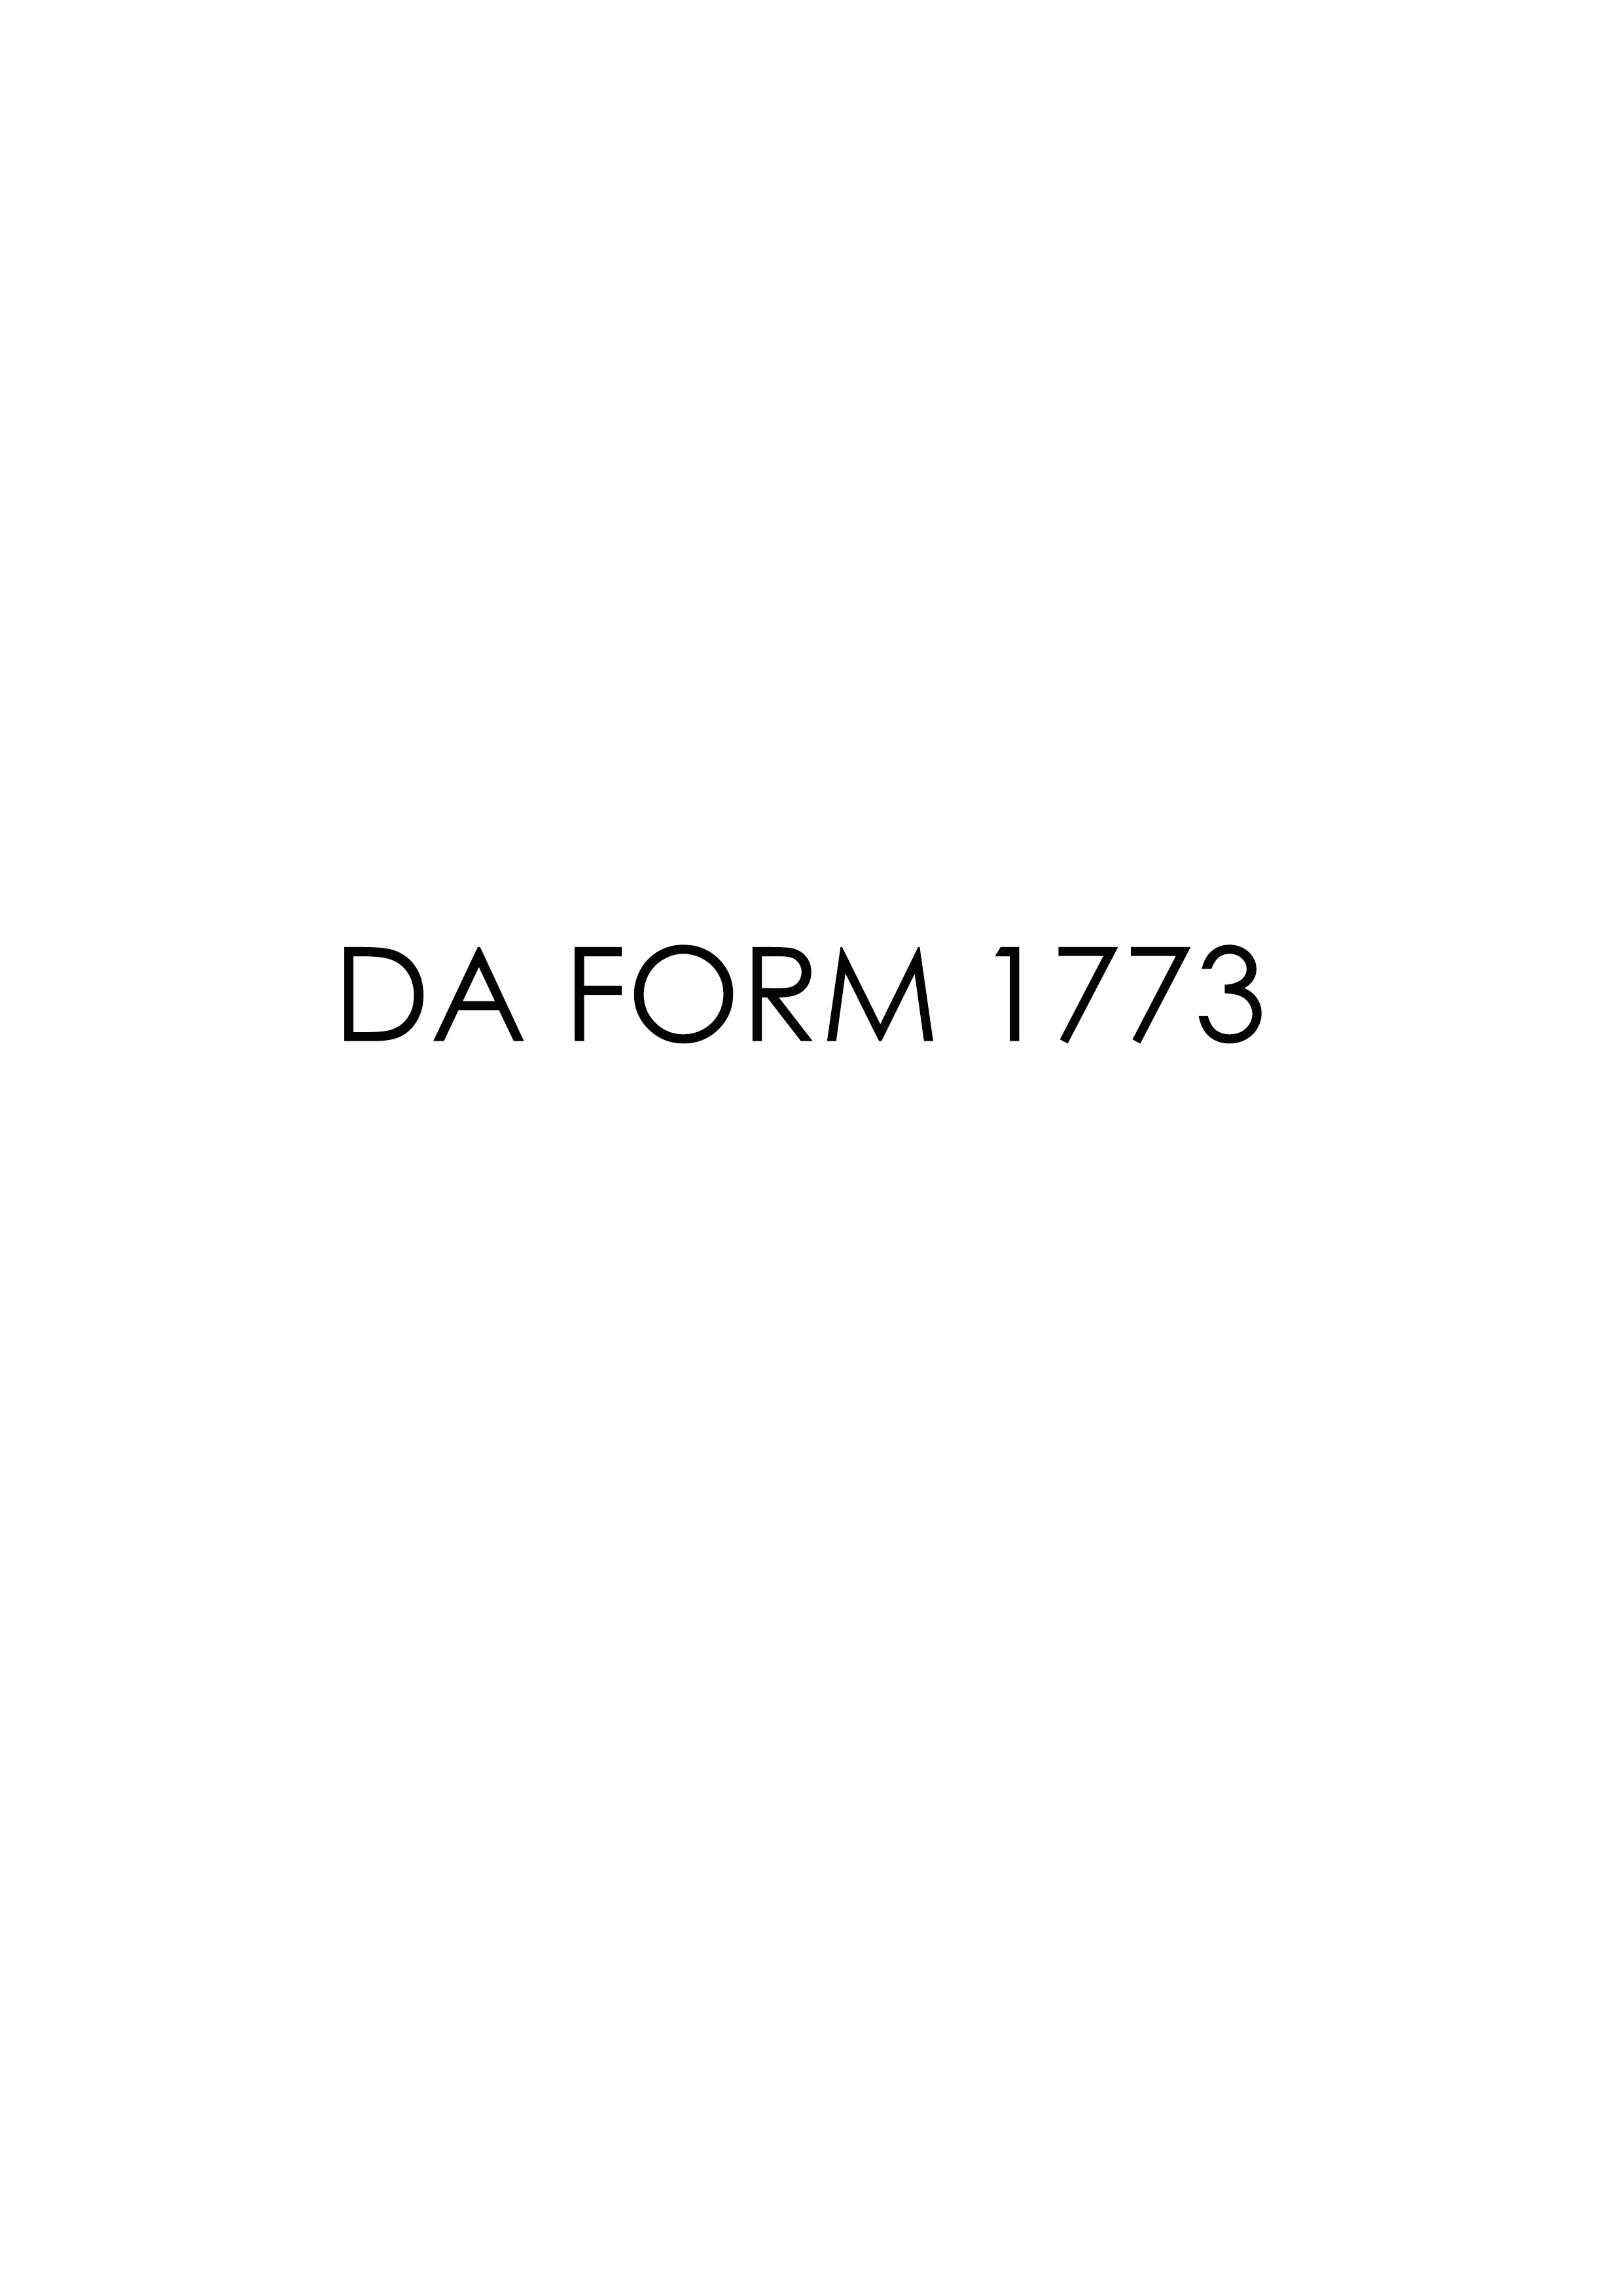 Download da Form 1773 Free